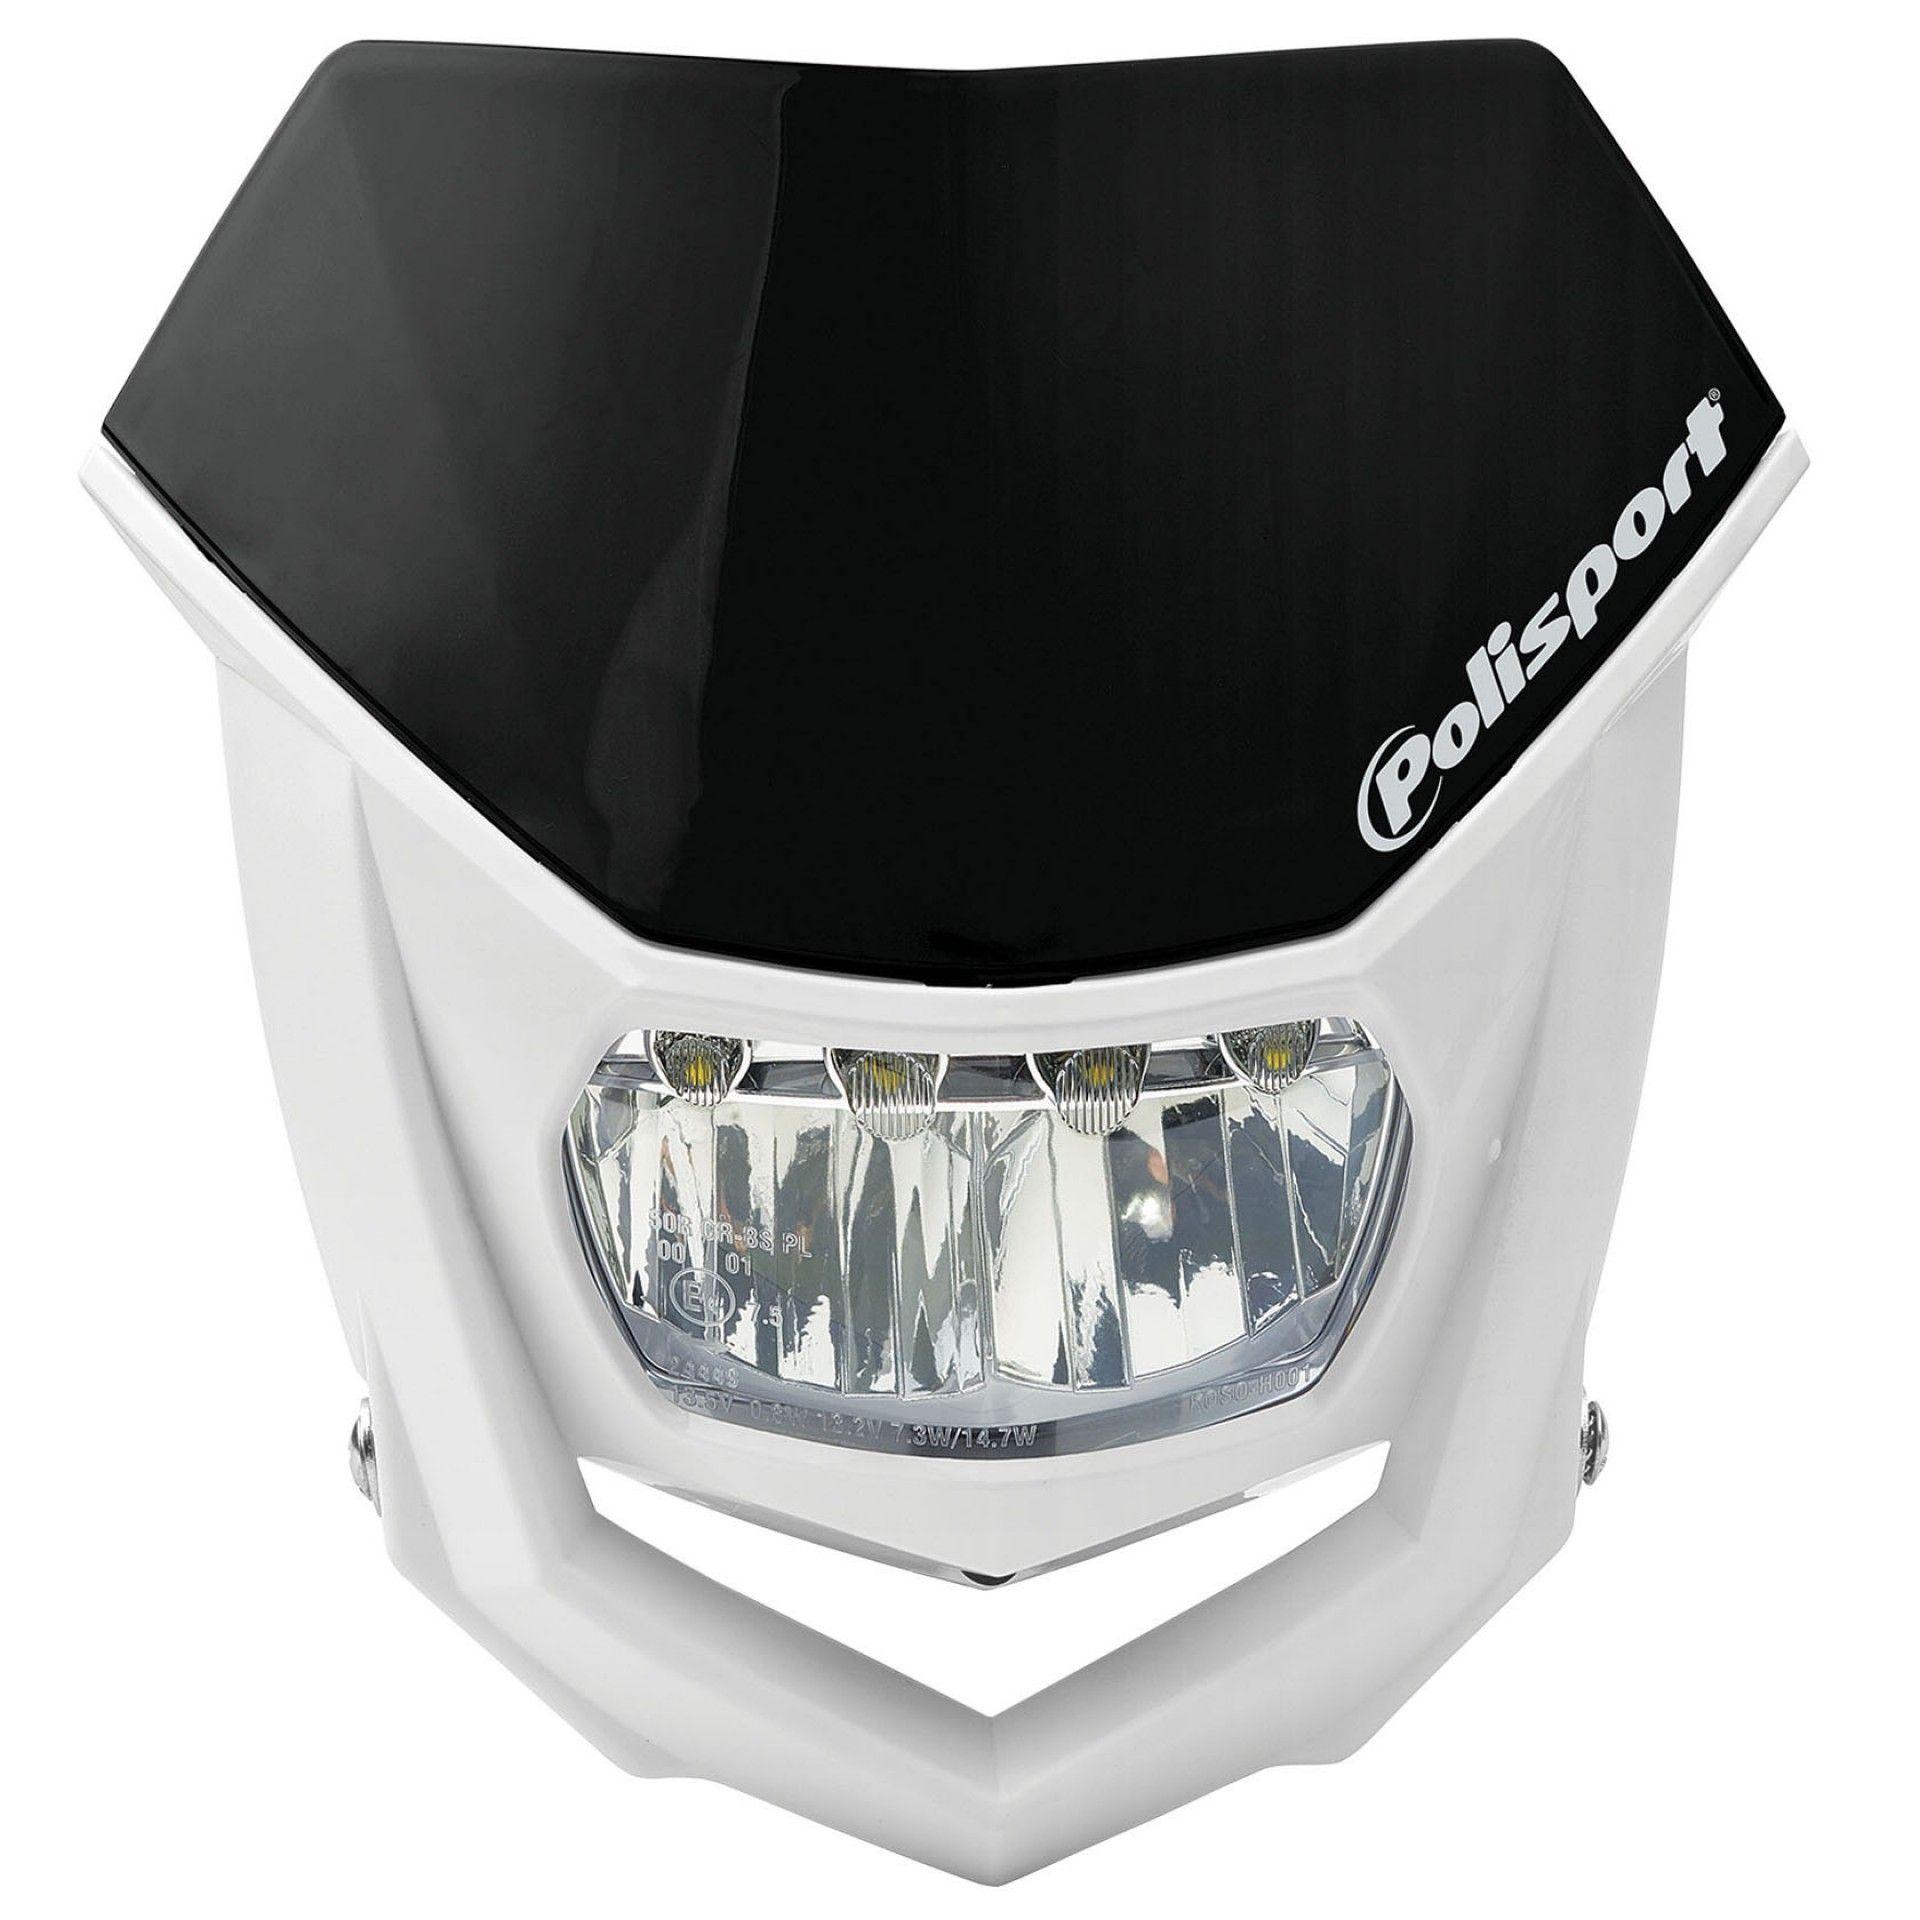 Lazer Star Lights Headlight Bracket and Kits Offer